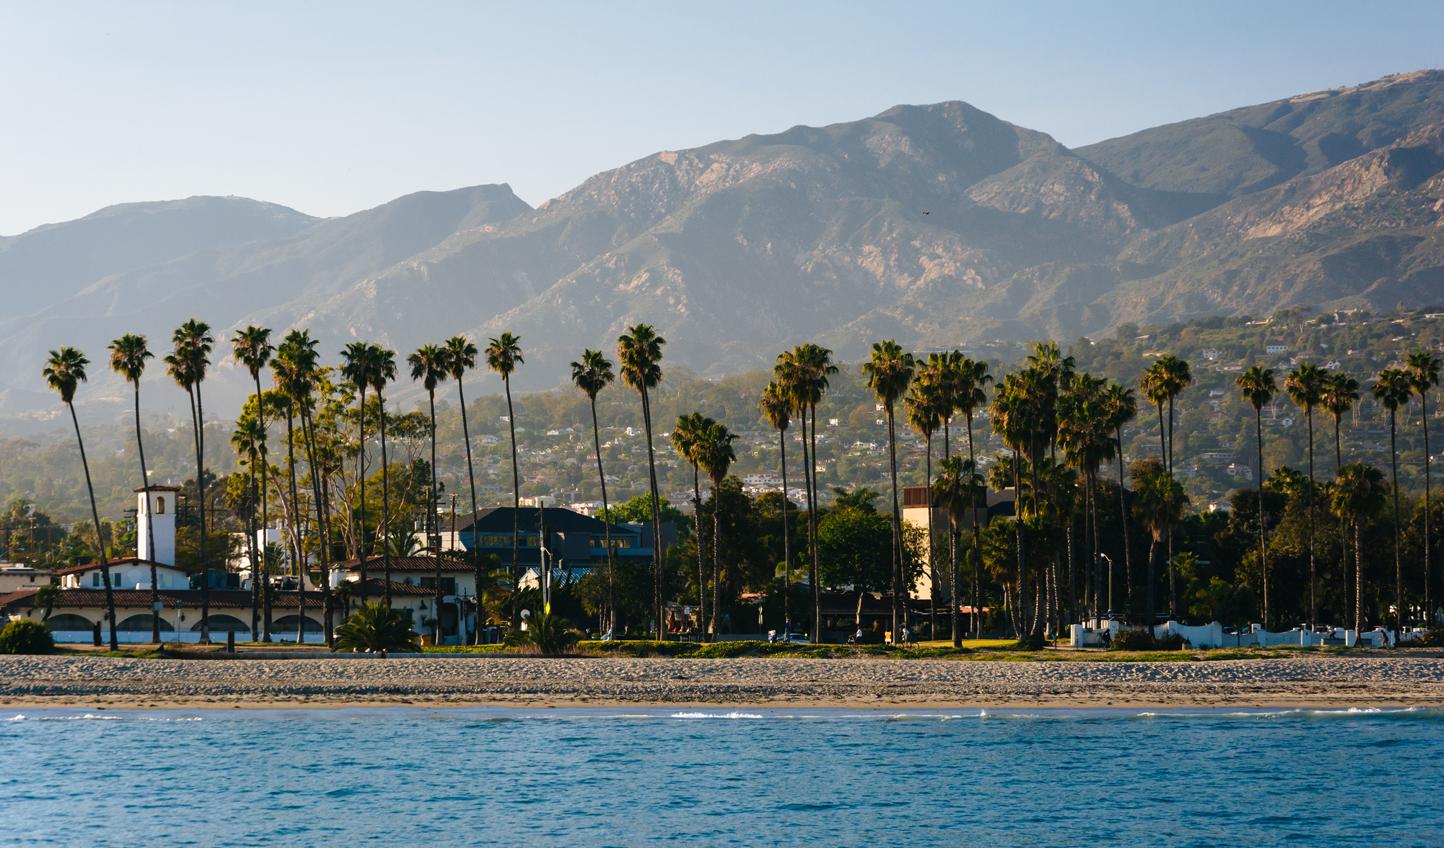 Laid back vibes in Santa Barbara